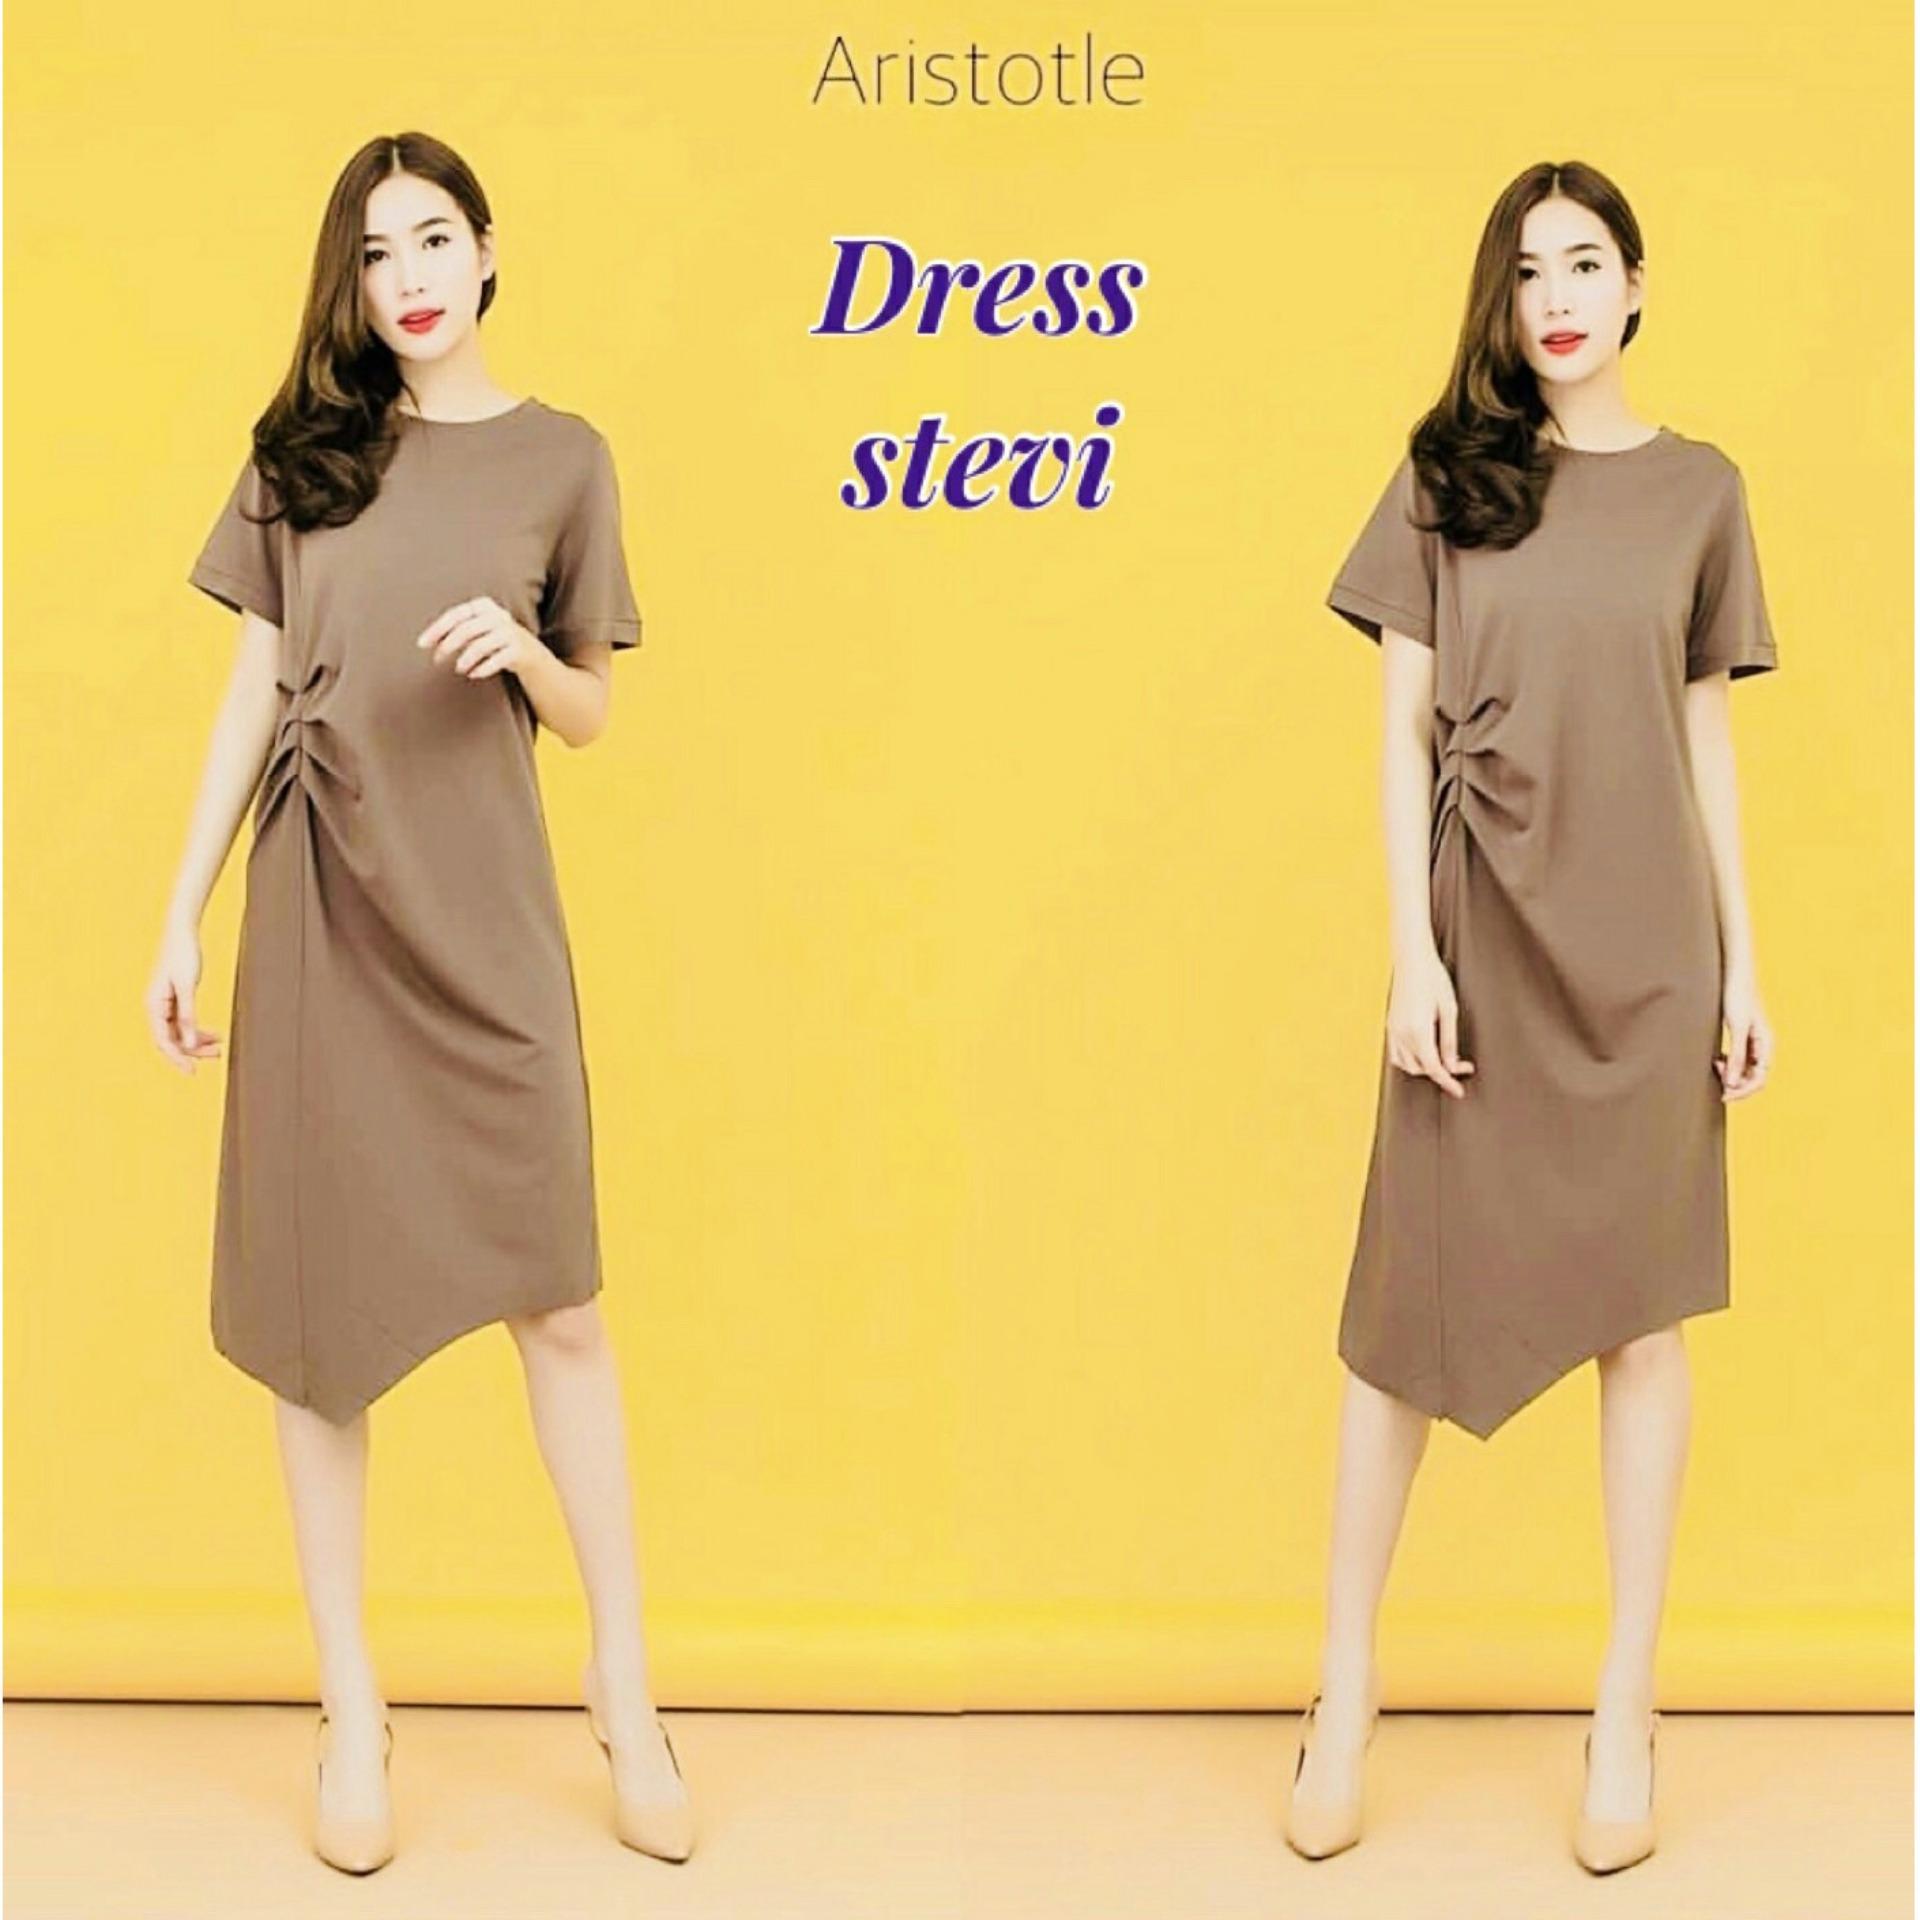 AmorShop Mini Dress Stevi /Pakaian Wanita /Dress 016